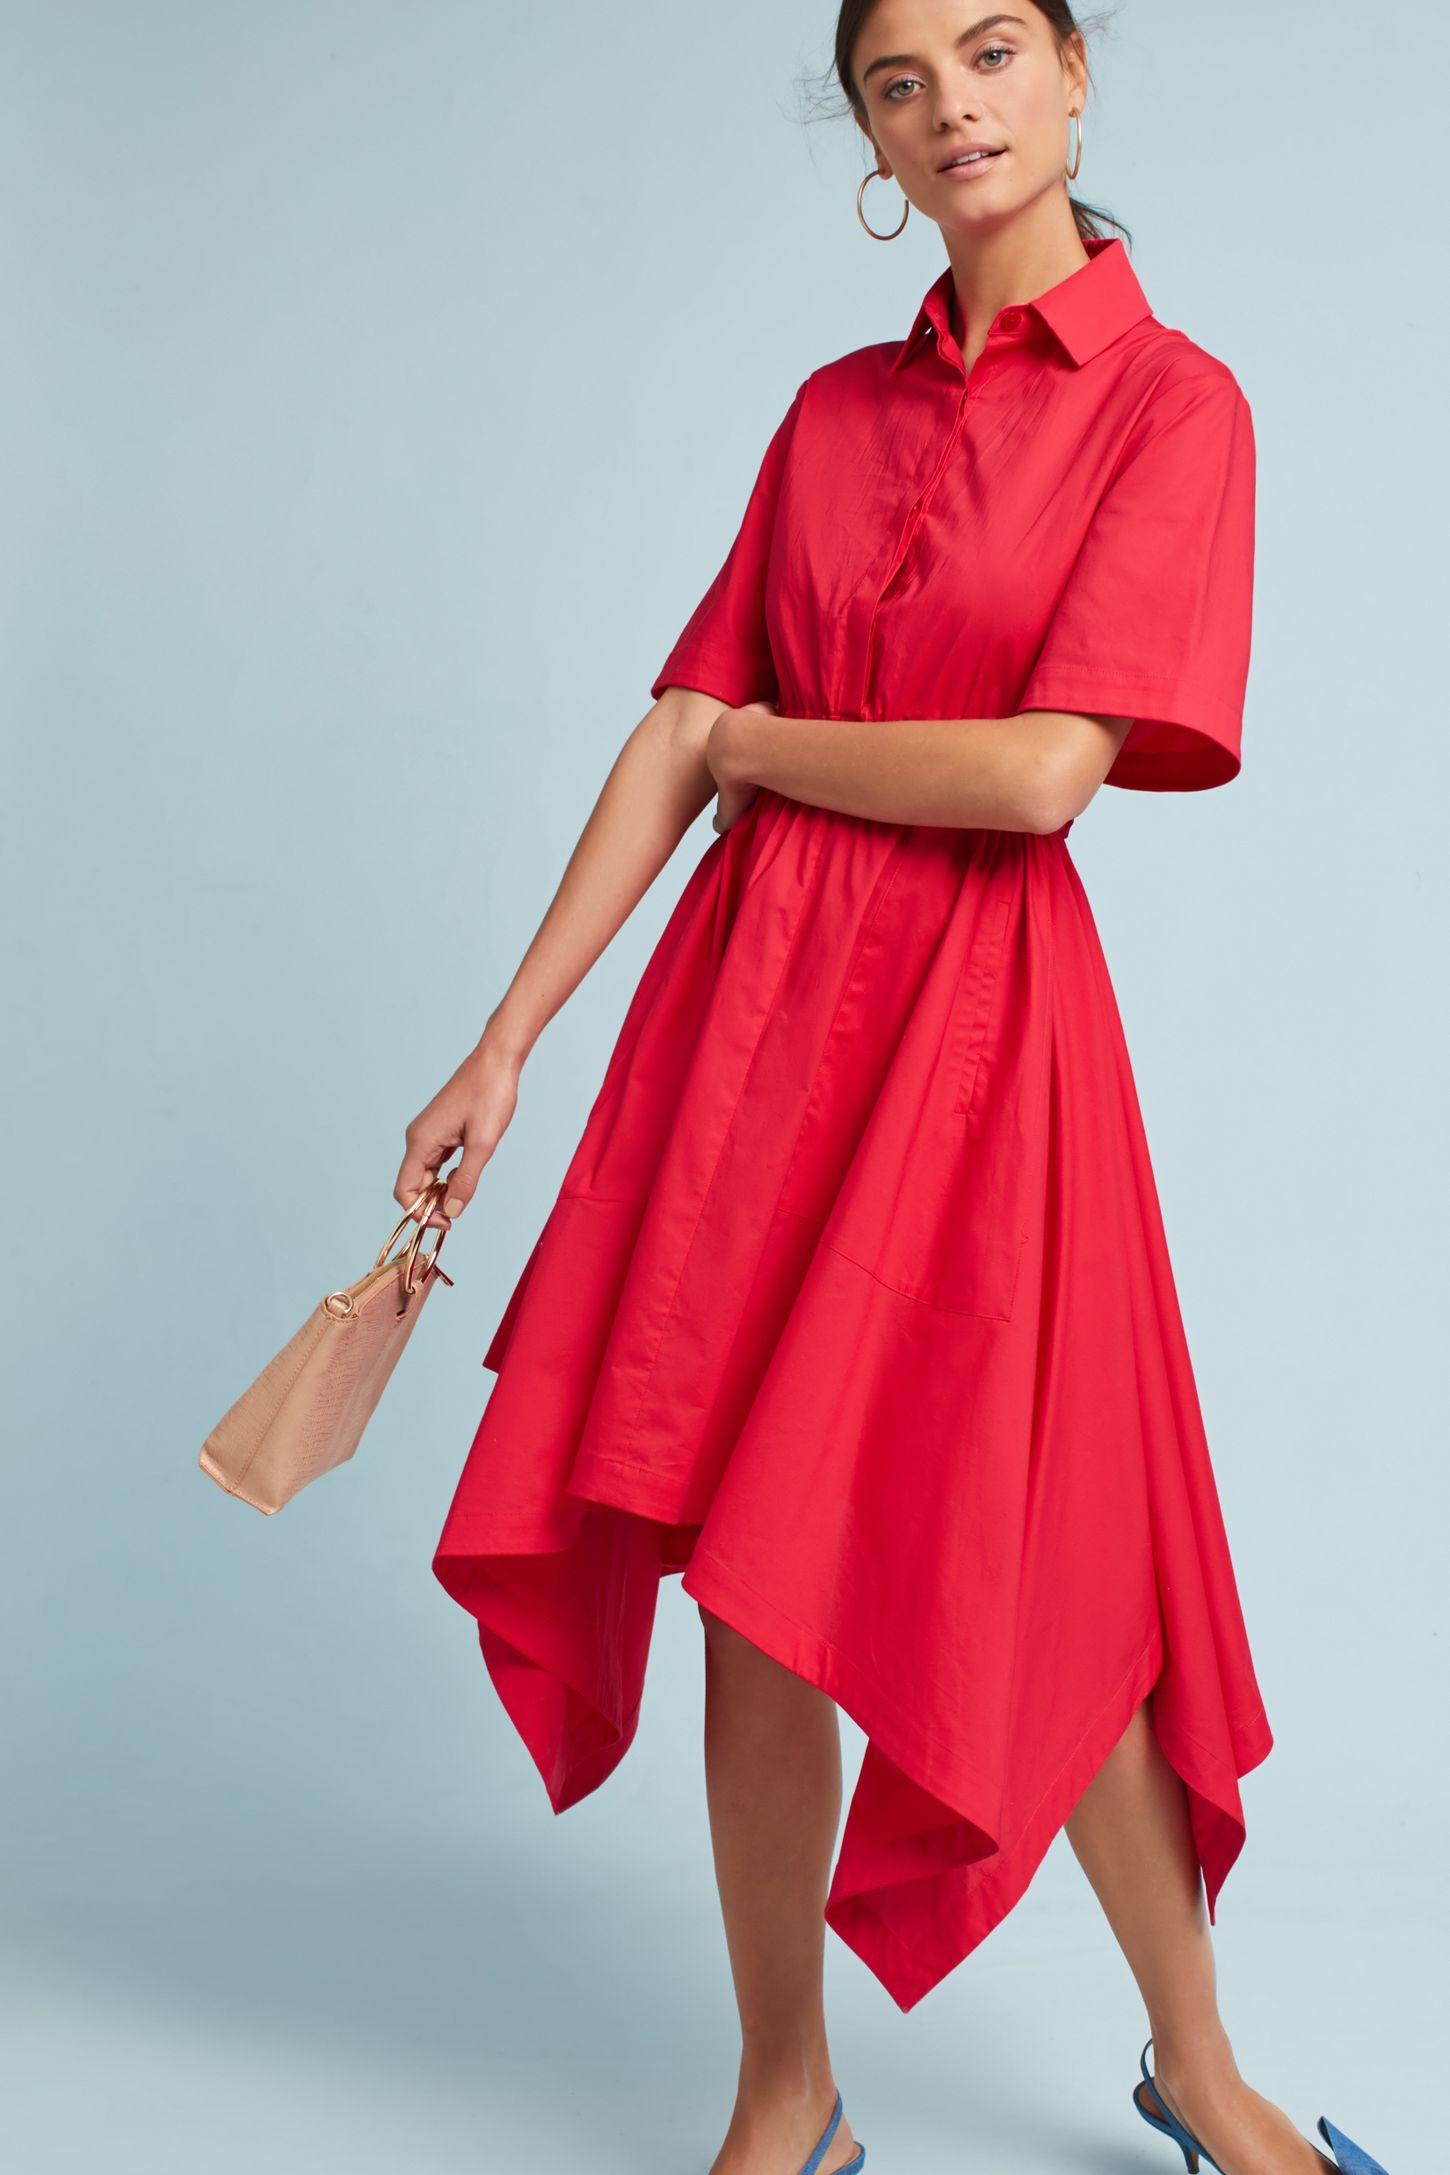 red-dress-shirt-midi-hoops-pony-hairr-blue-shoe-pumps-slingback-tan-bag-anthropologie-spring-summer-lunch.jpg